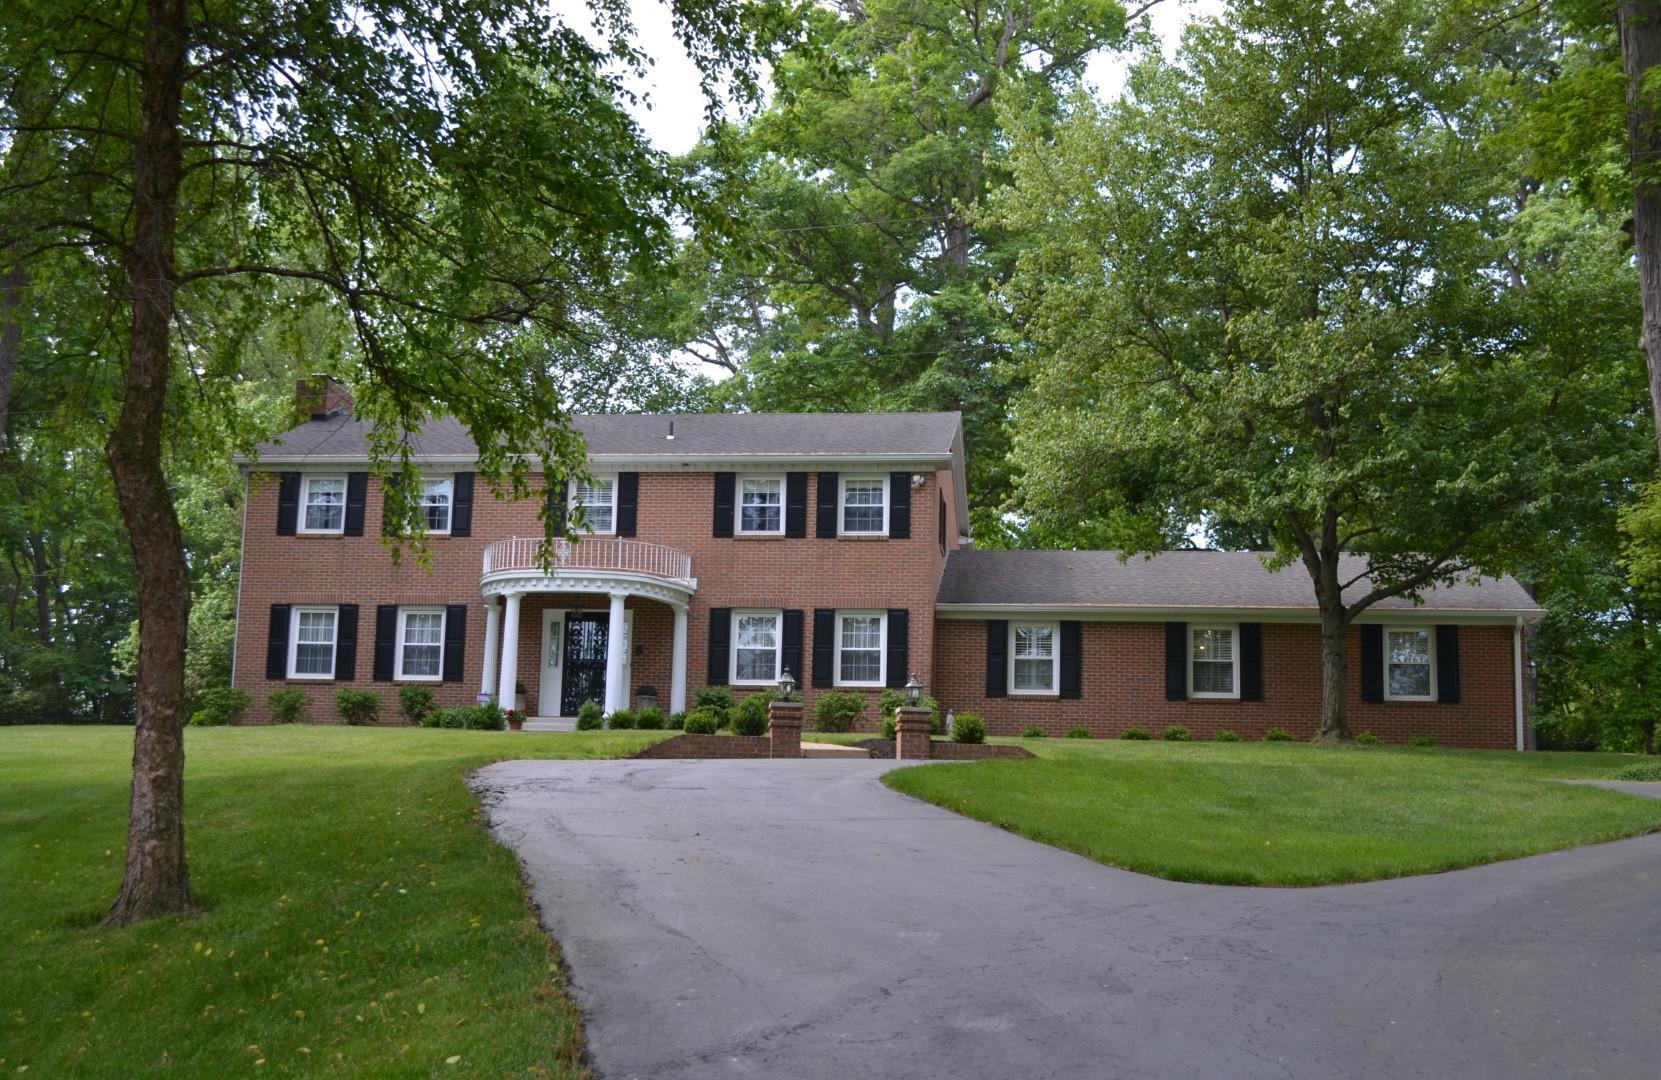 5585 Old Rte 70 Property Photo 1